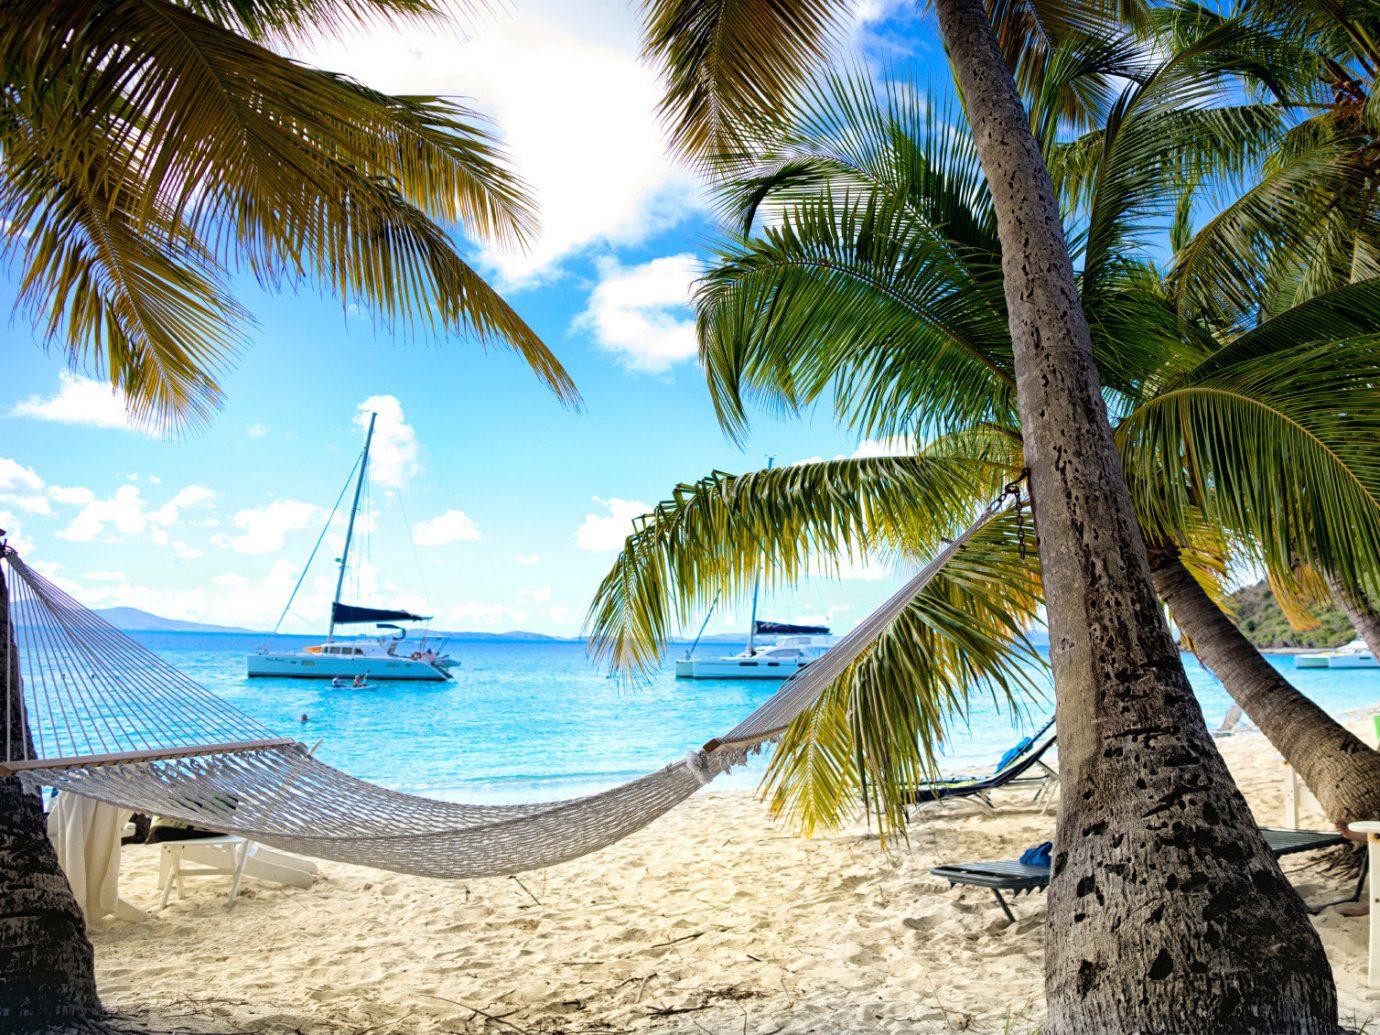 Hotels Trip Ideas tree palm outdoor Beach water plant caribbean vacation tropics Sea hammock arecales Ocean Resort Pool palm family swimming pool Jungle sandy shade lined